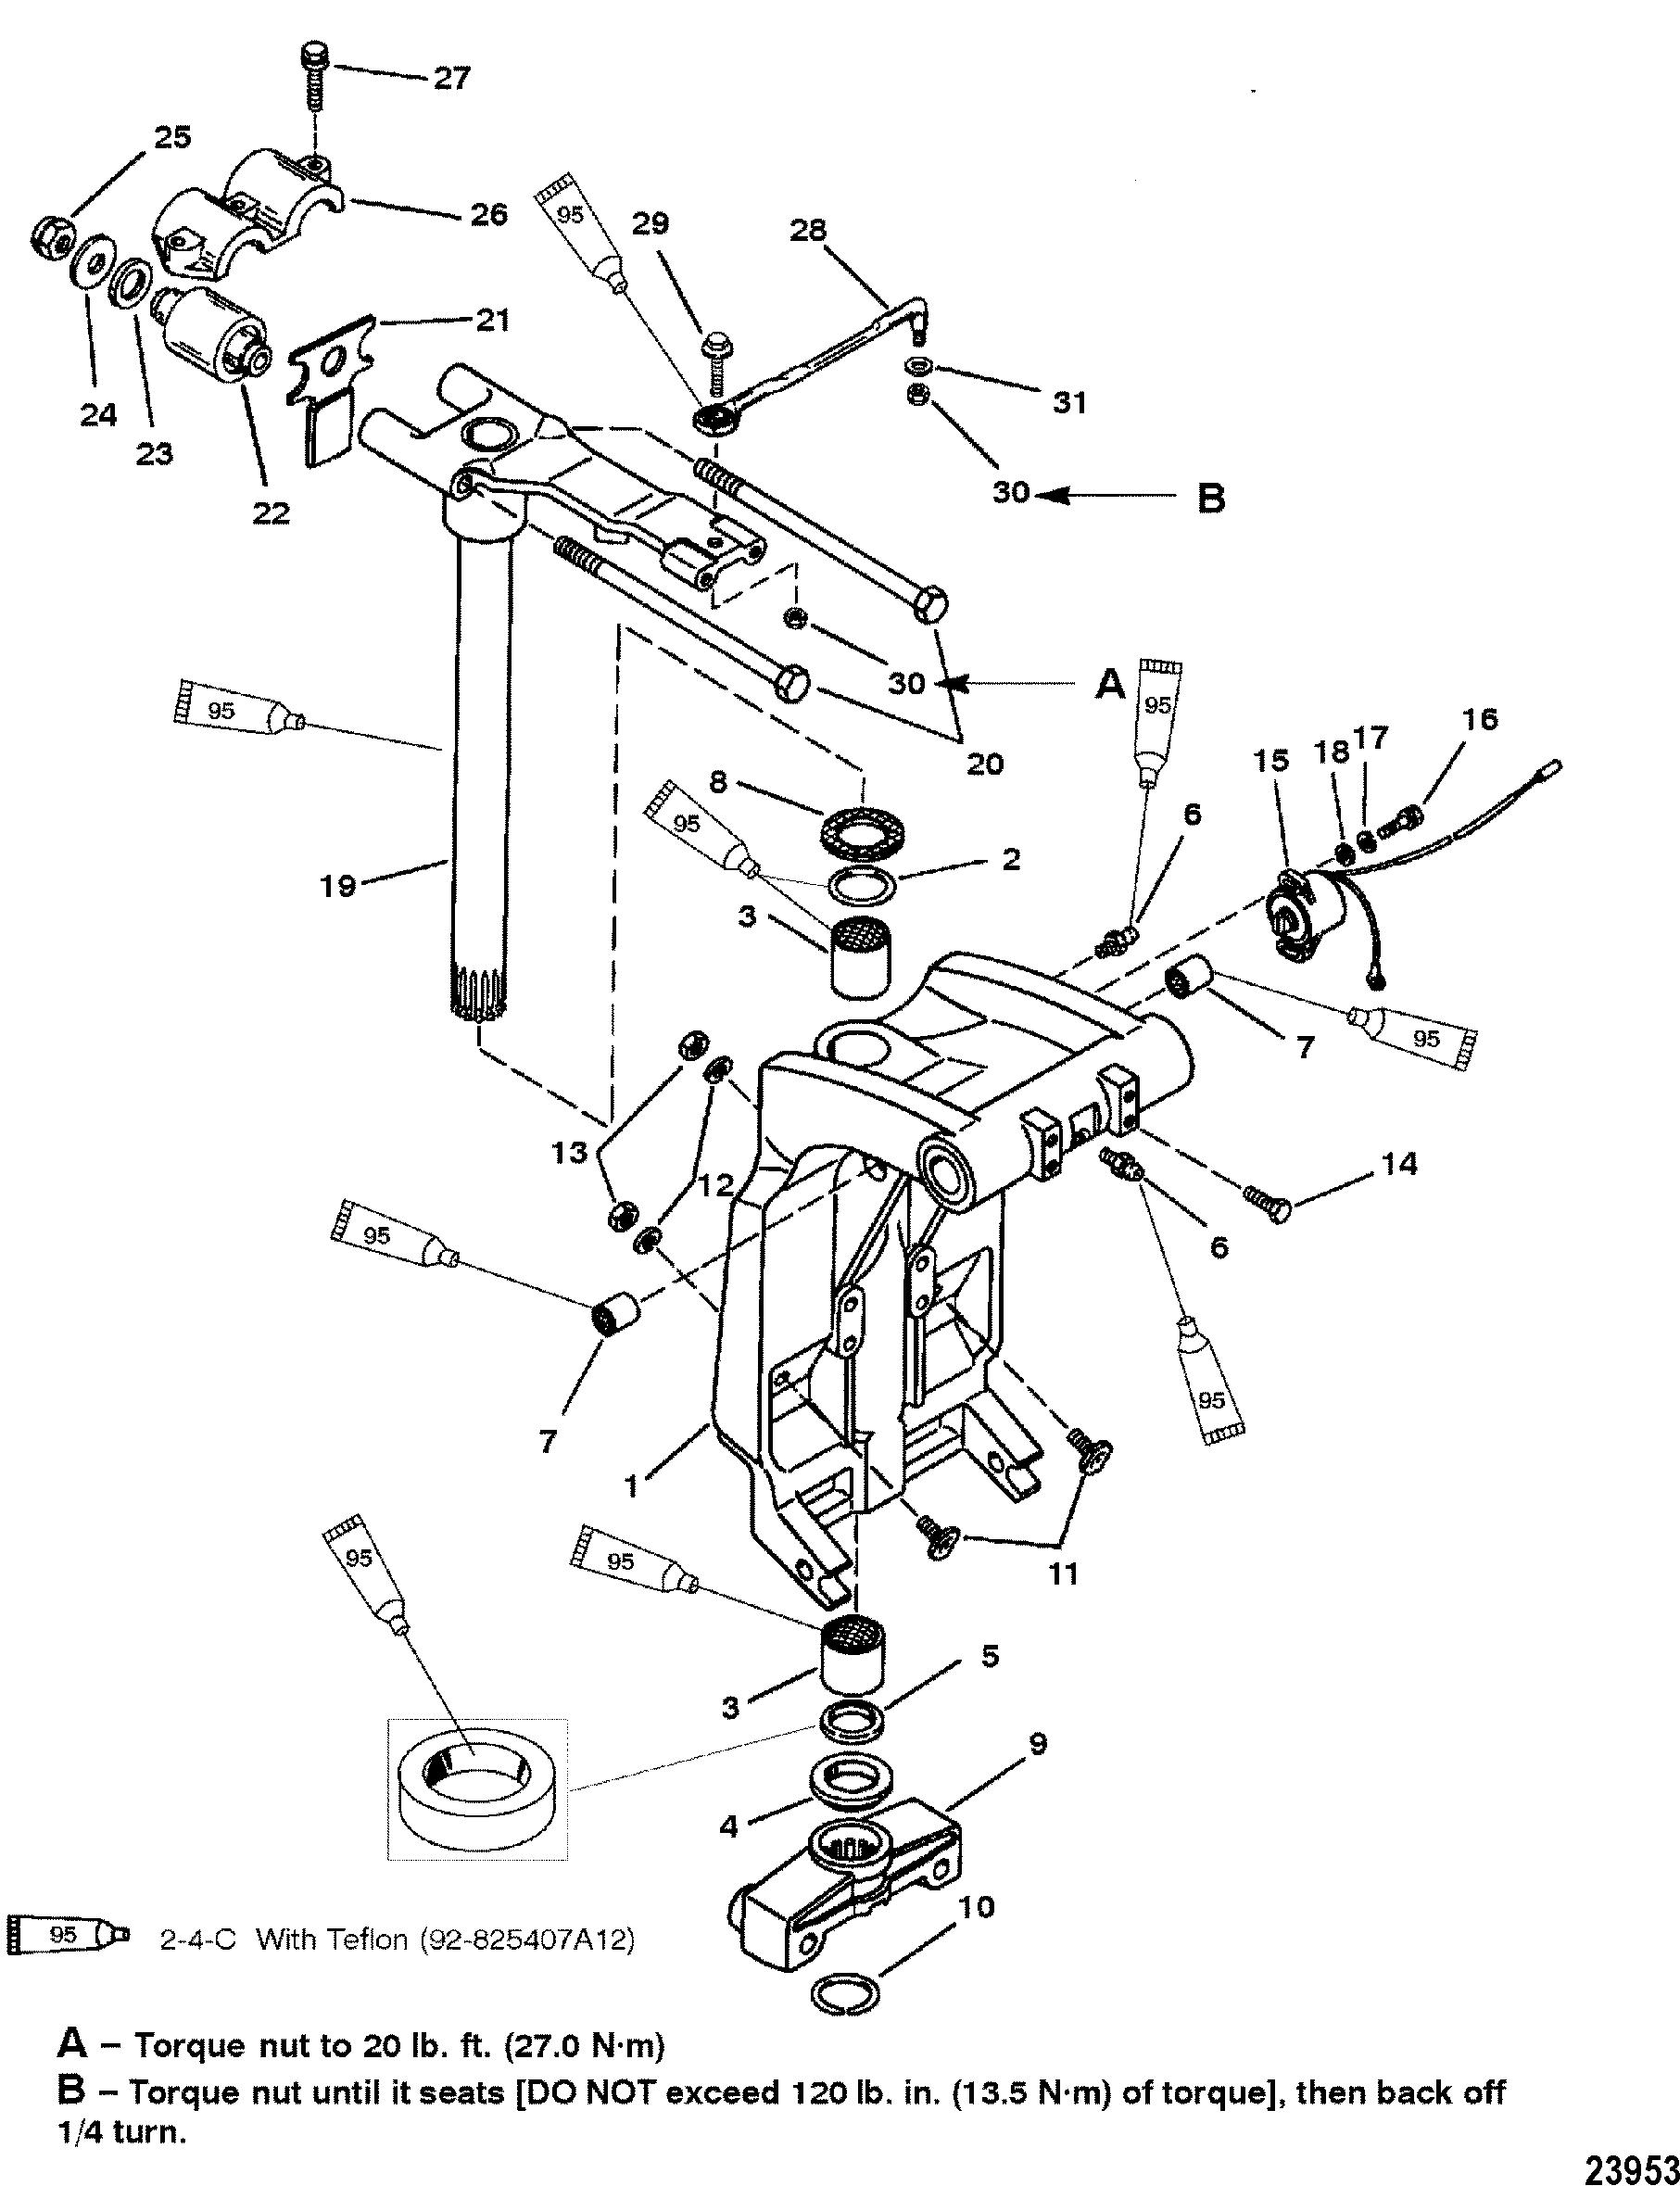 SWIVEL BRACKET AND STEERING ARM FOR MARINER / MERCURY 225